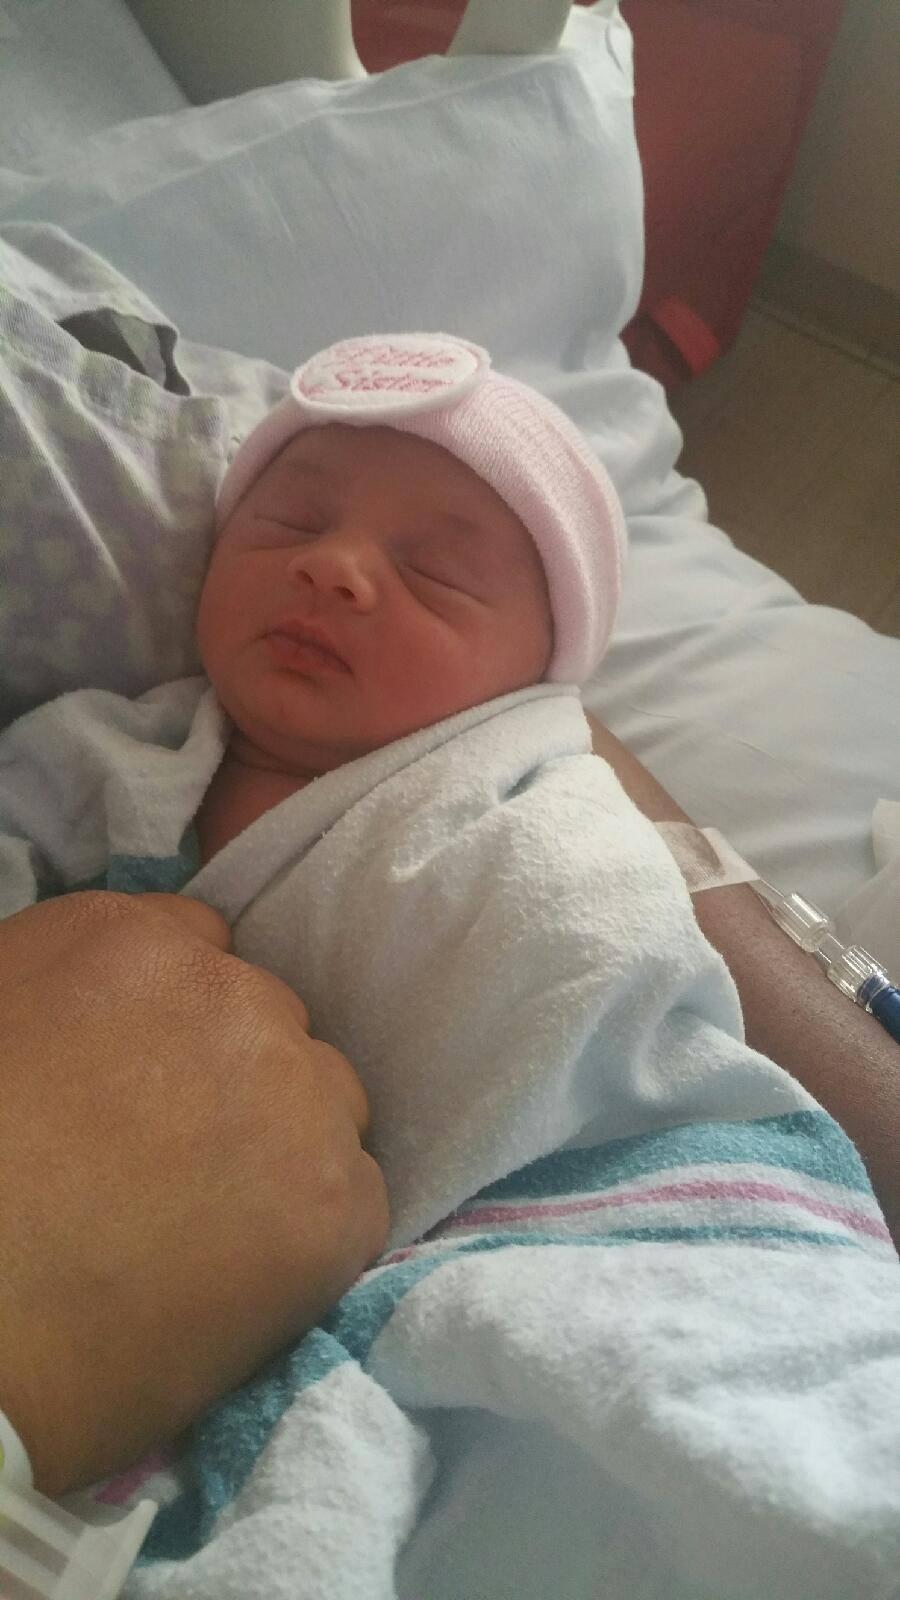 Newborn Yuri (exactly a year ago today!)